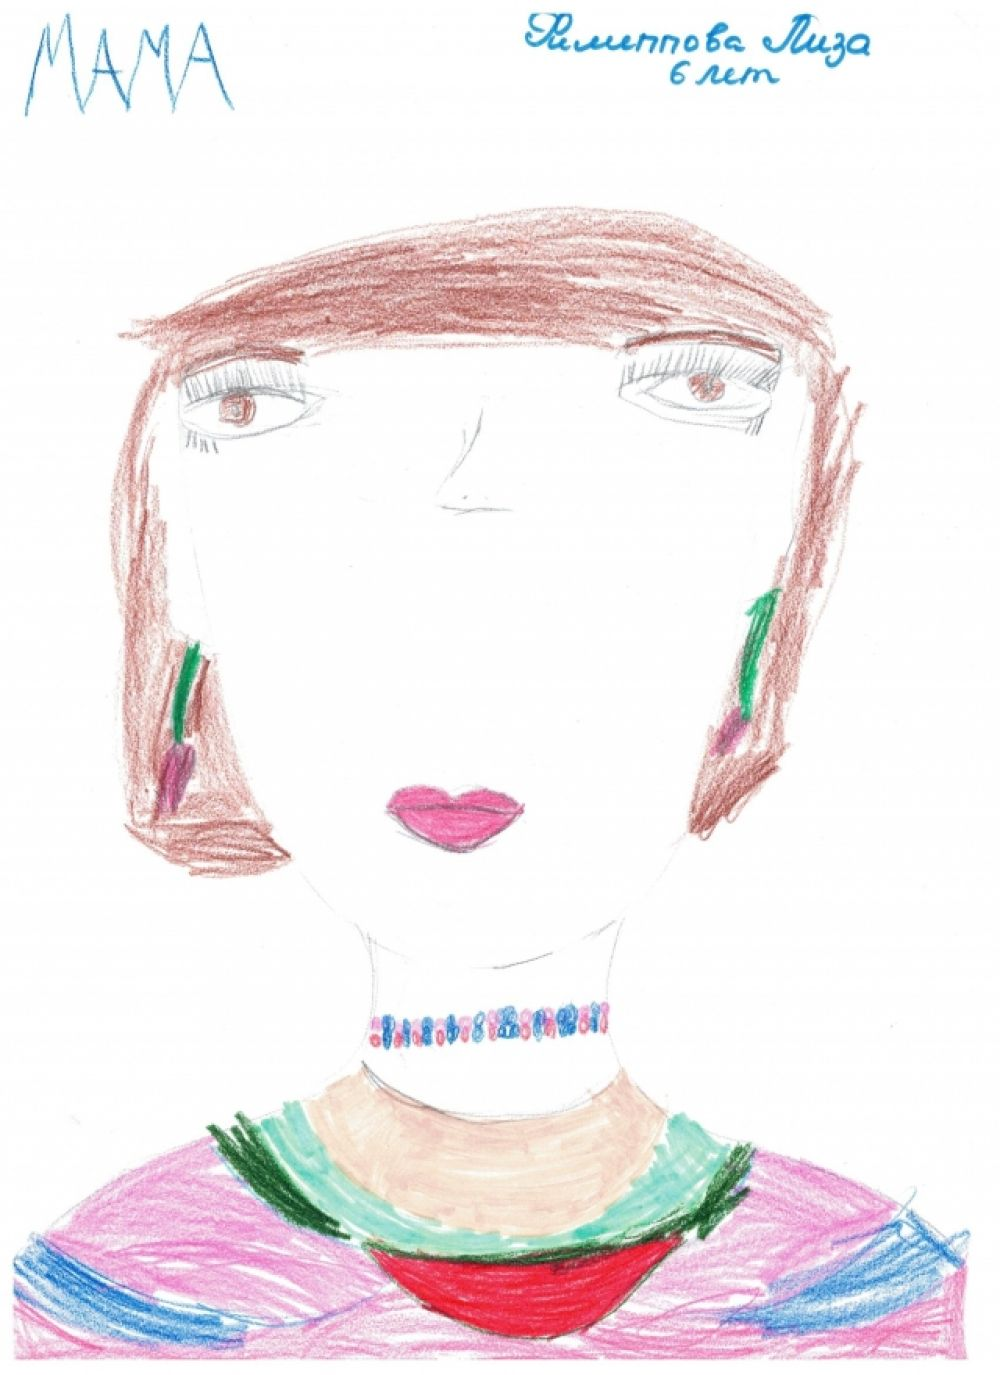 Участник №270. Филиппова Лиза